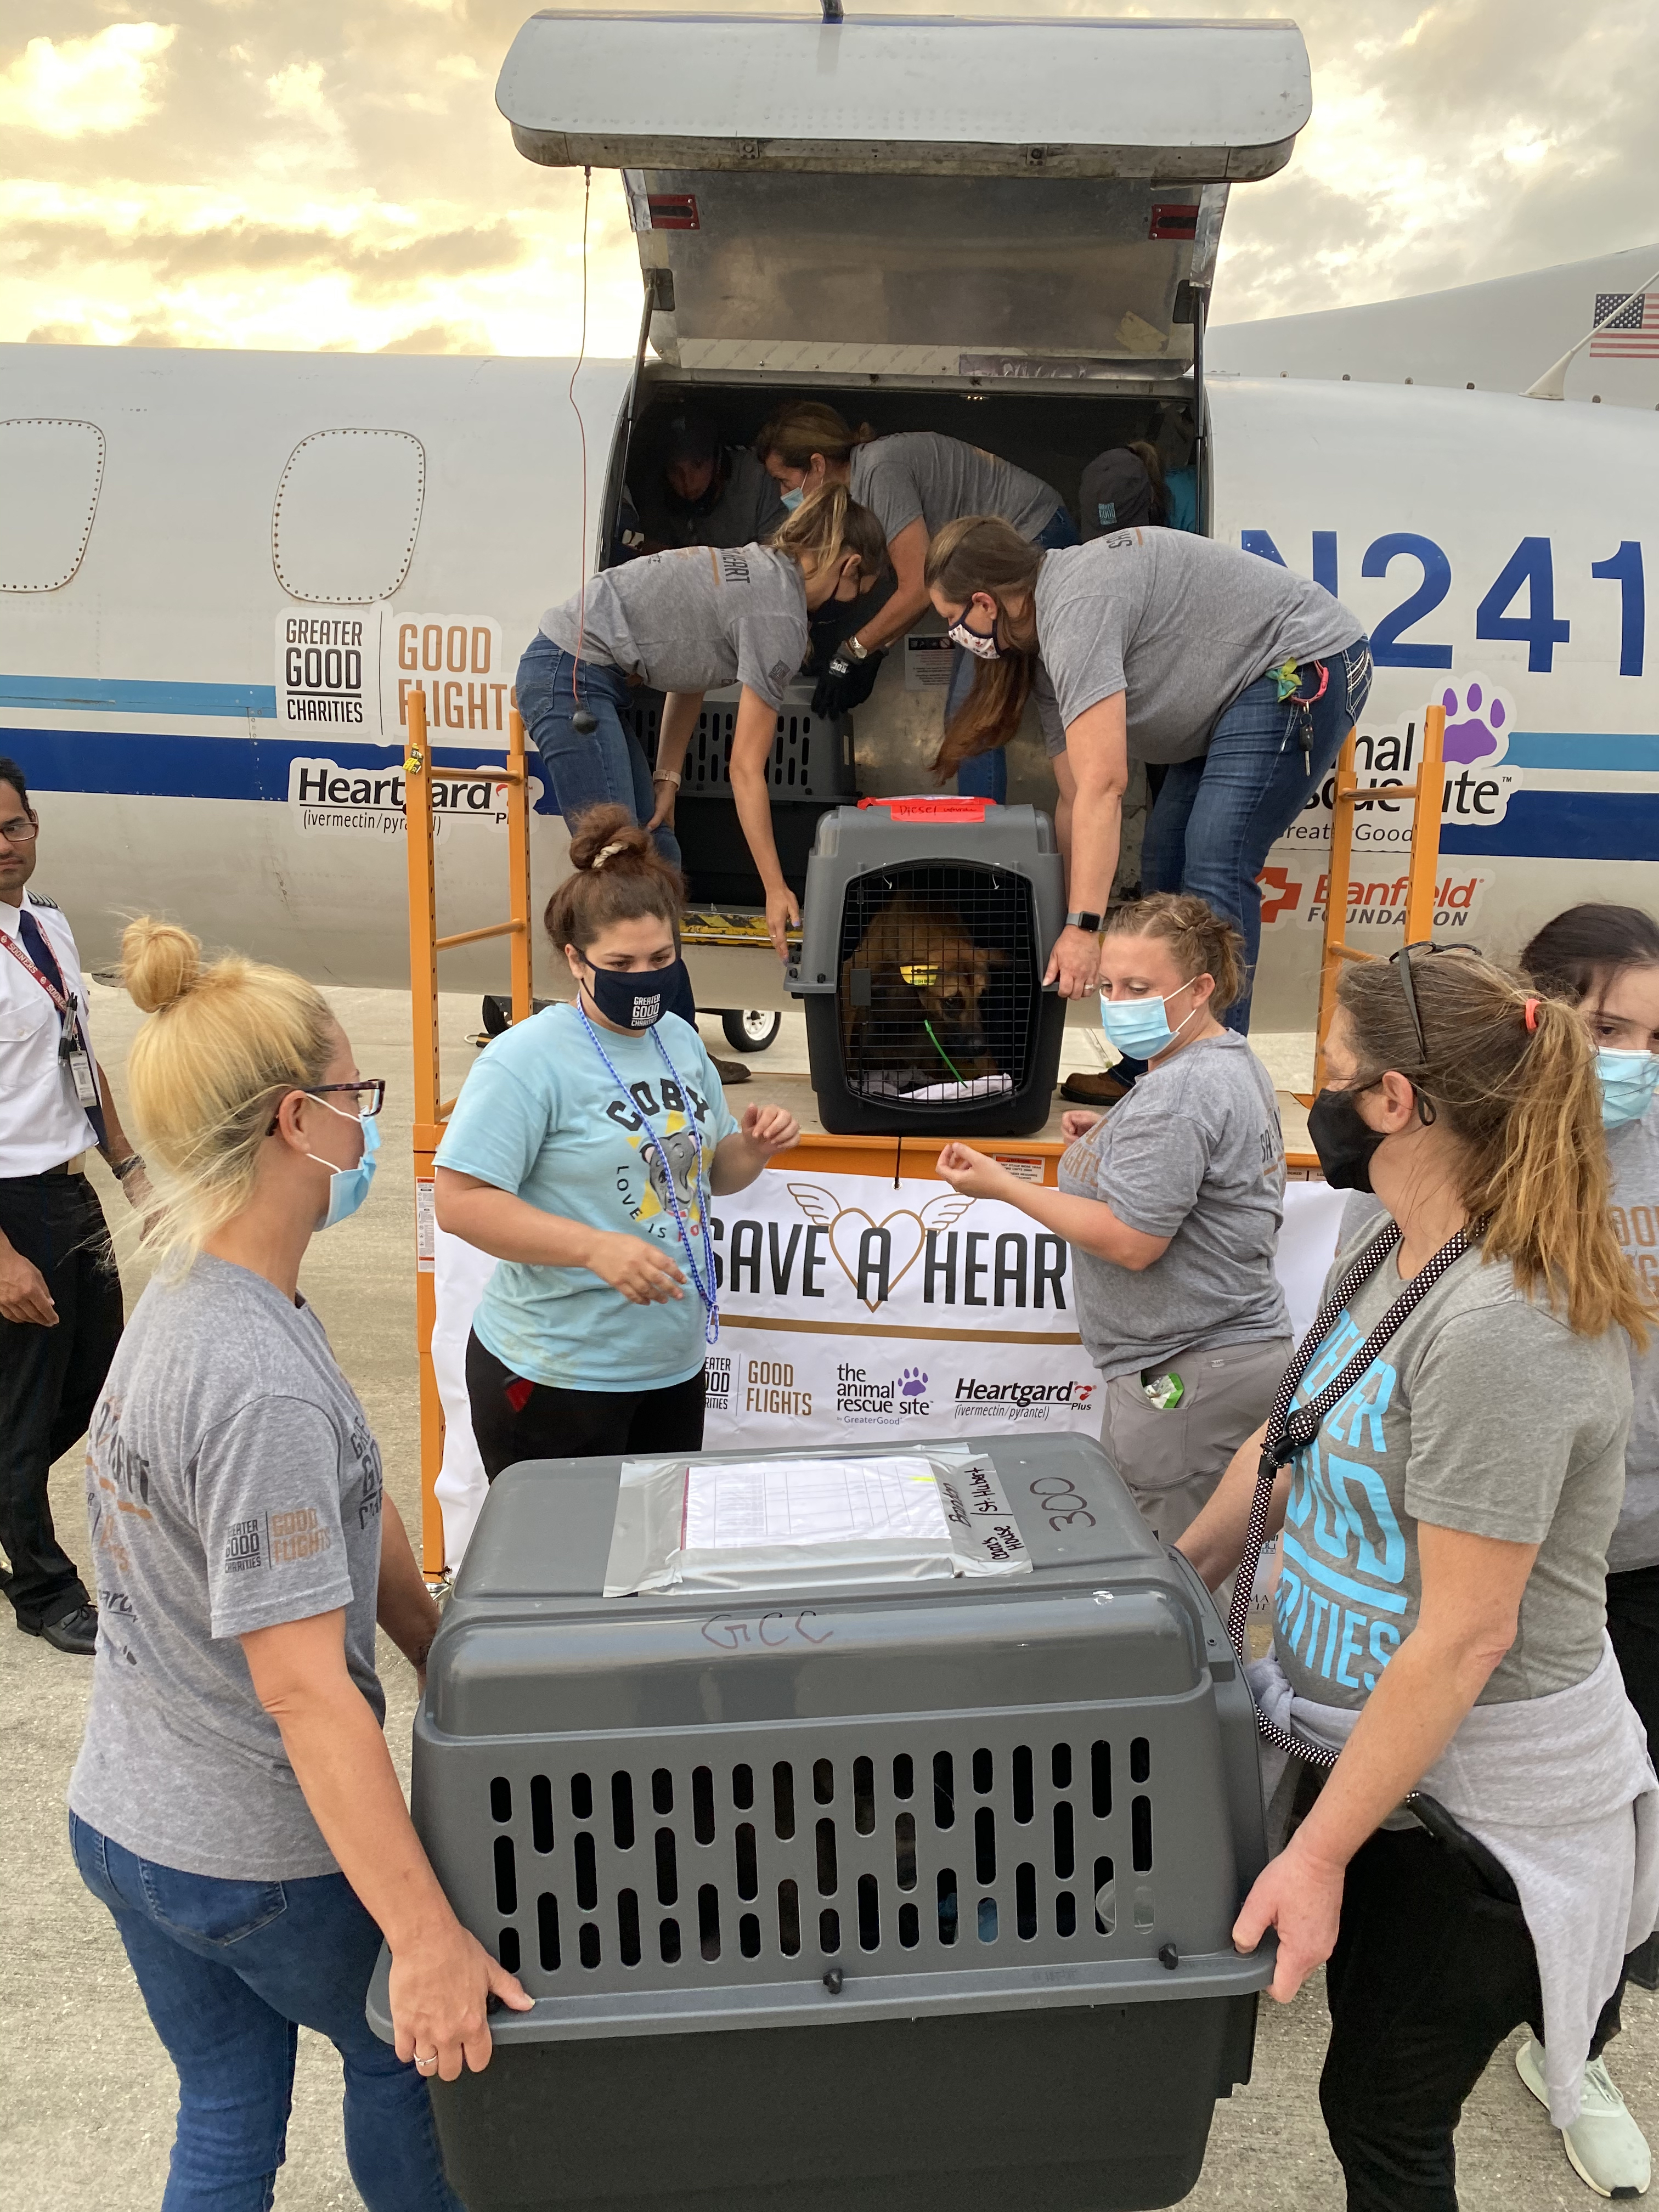 Diesel Loaded on Plane_©St. Charles Parish Animal Shelter_GF SAH 5-17-21